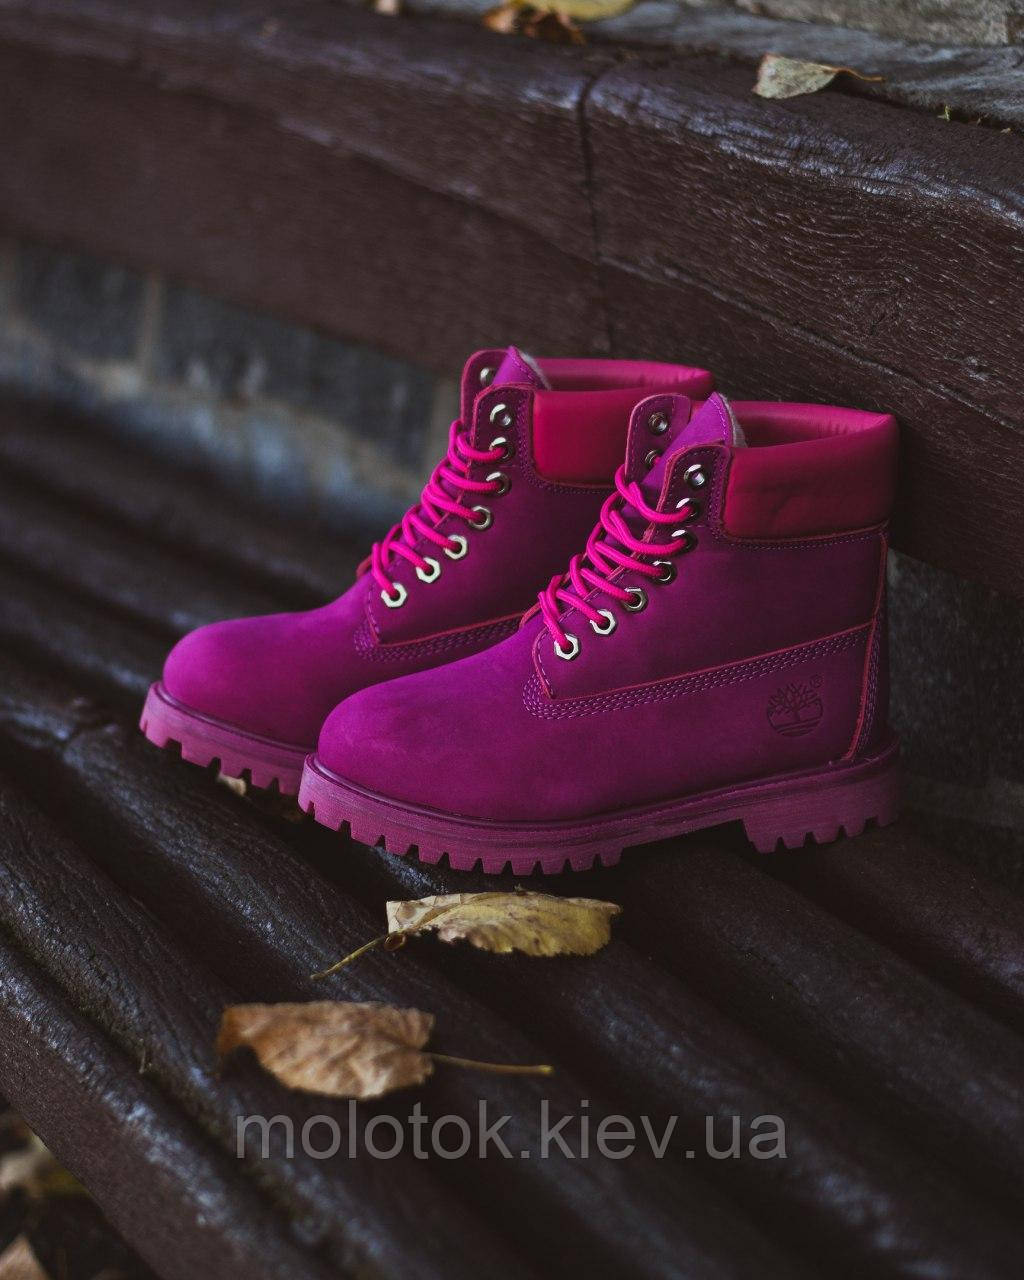 Женские зимние ботинки в стиле Timberland сиреневые на меху